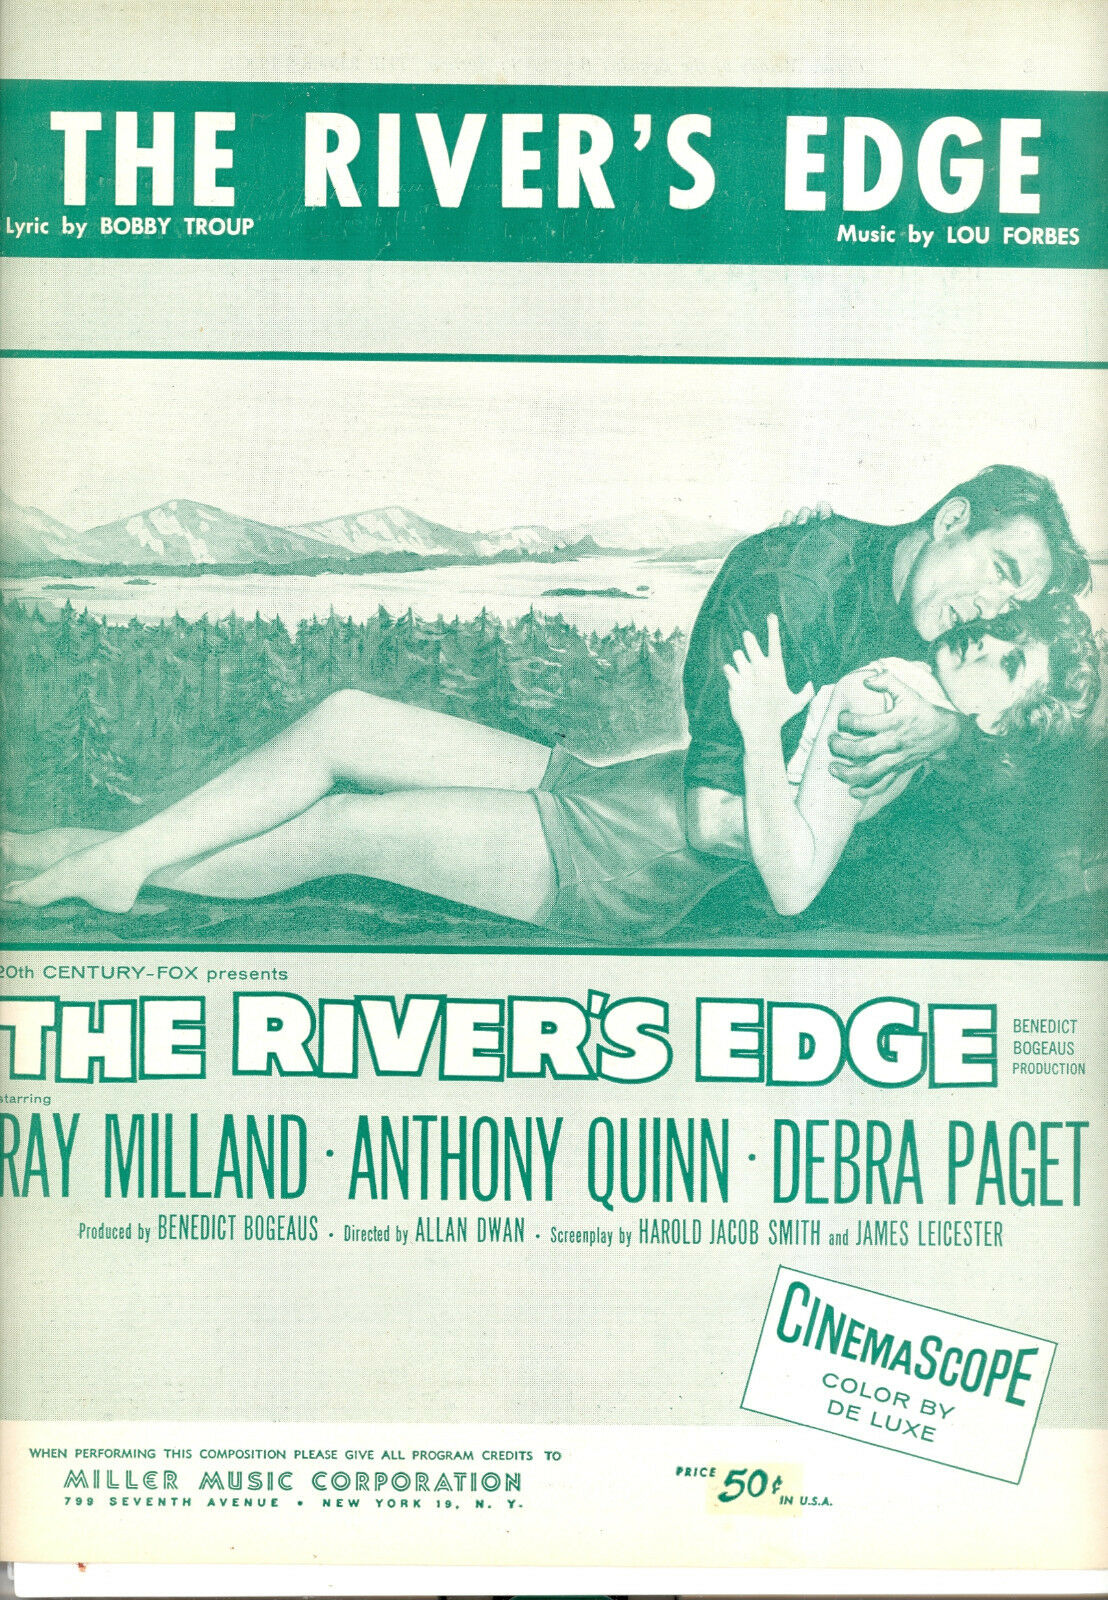 THE RIVER'S EDGE Sheet Music  River's Edge  Debra Paget Anthony Quinn